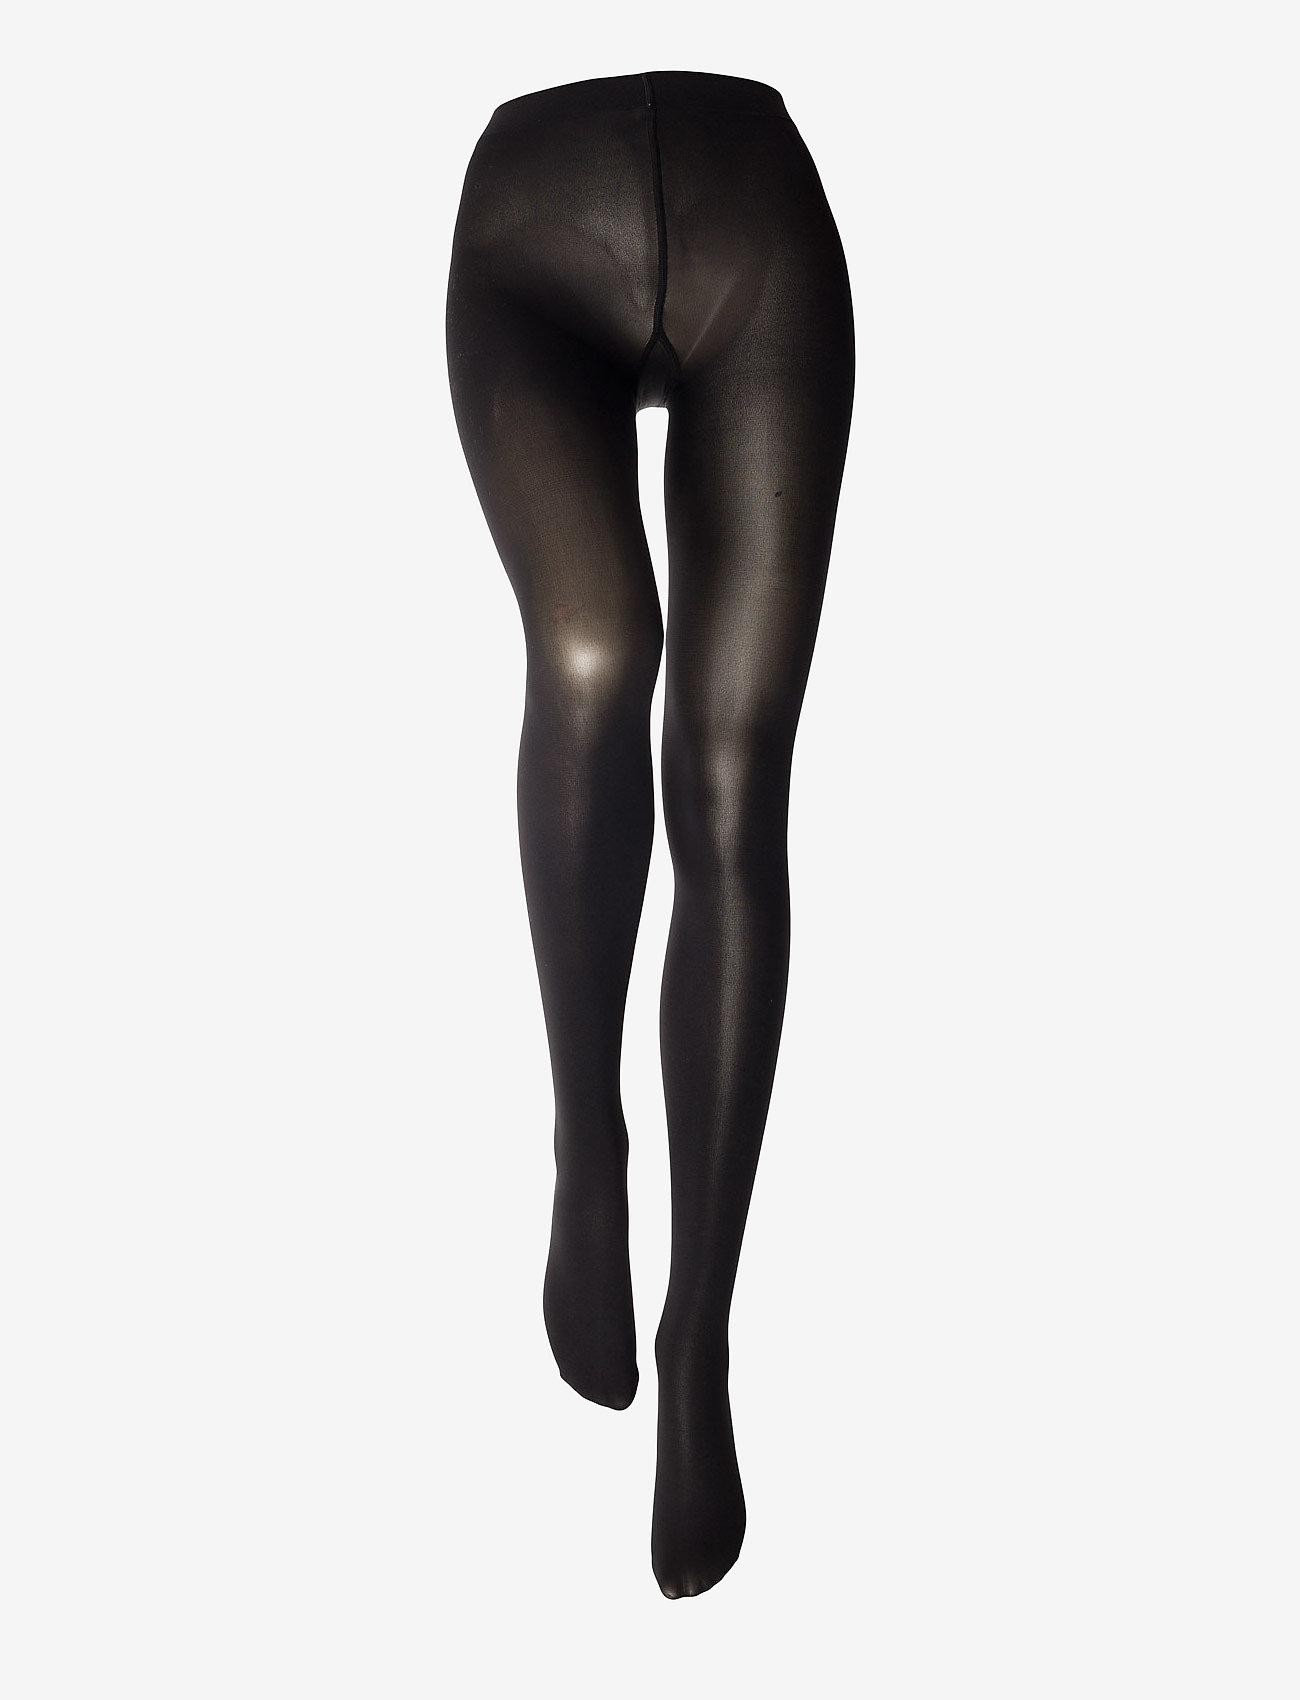 Wolford - Individual 50 leg support - zeķbikses - black - 1